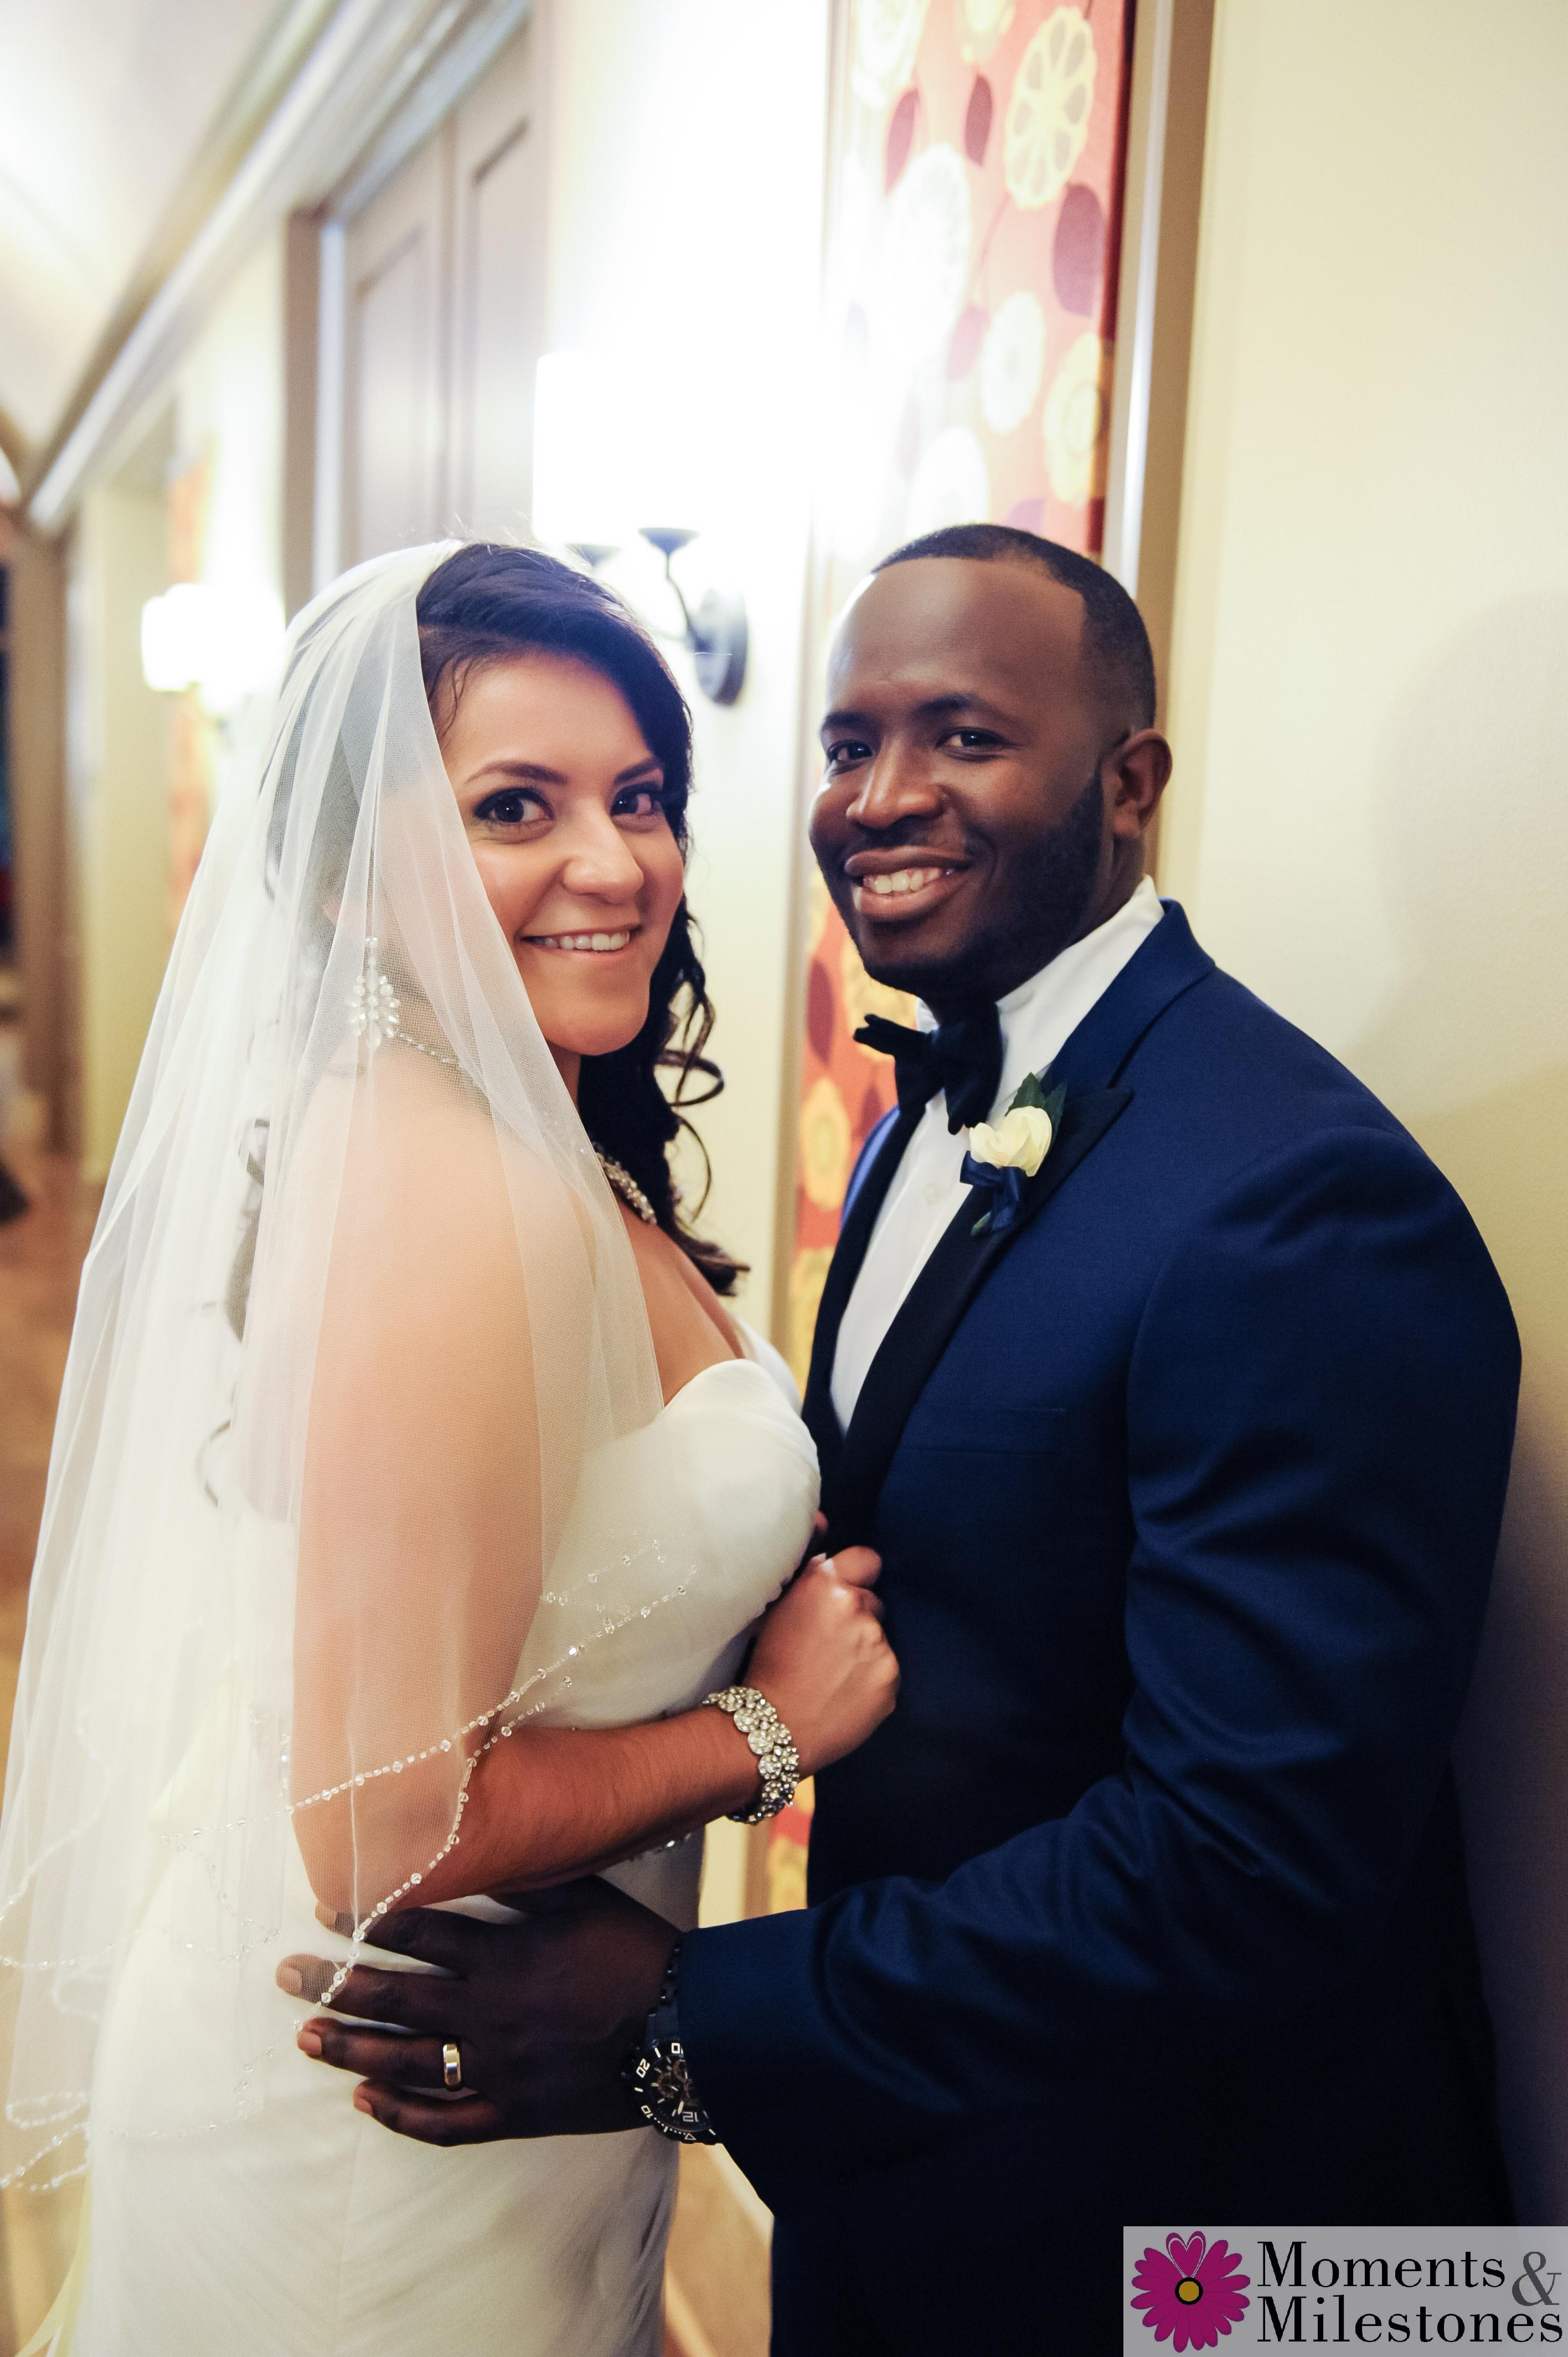 San Antonio NOAH'S Event Venue Wedding Planning and Wedding Photography